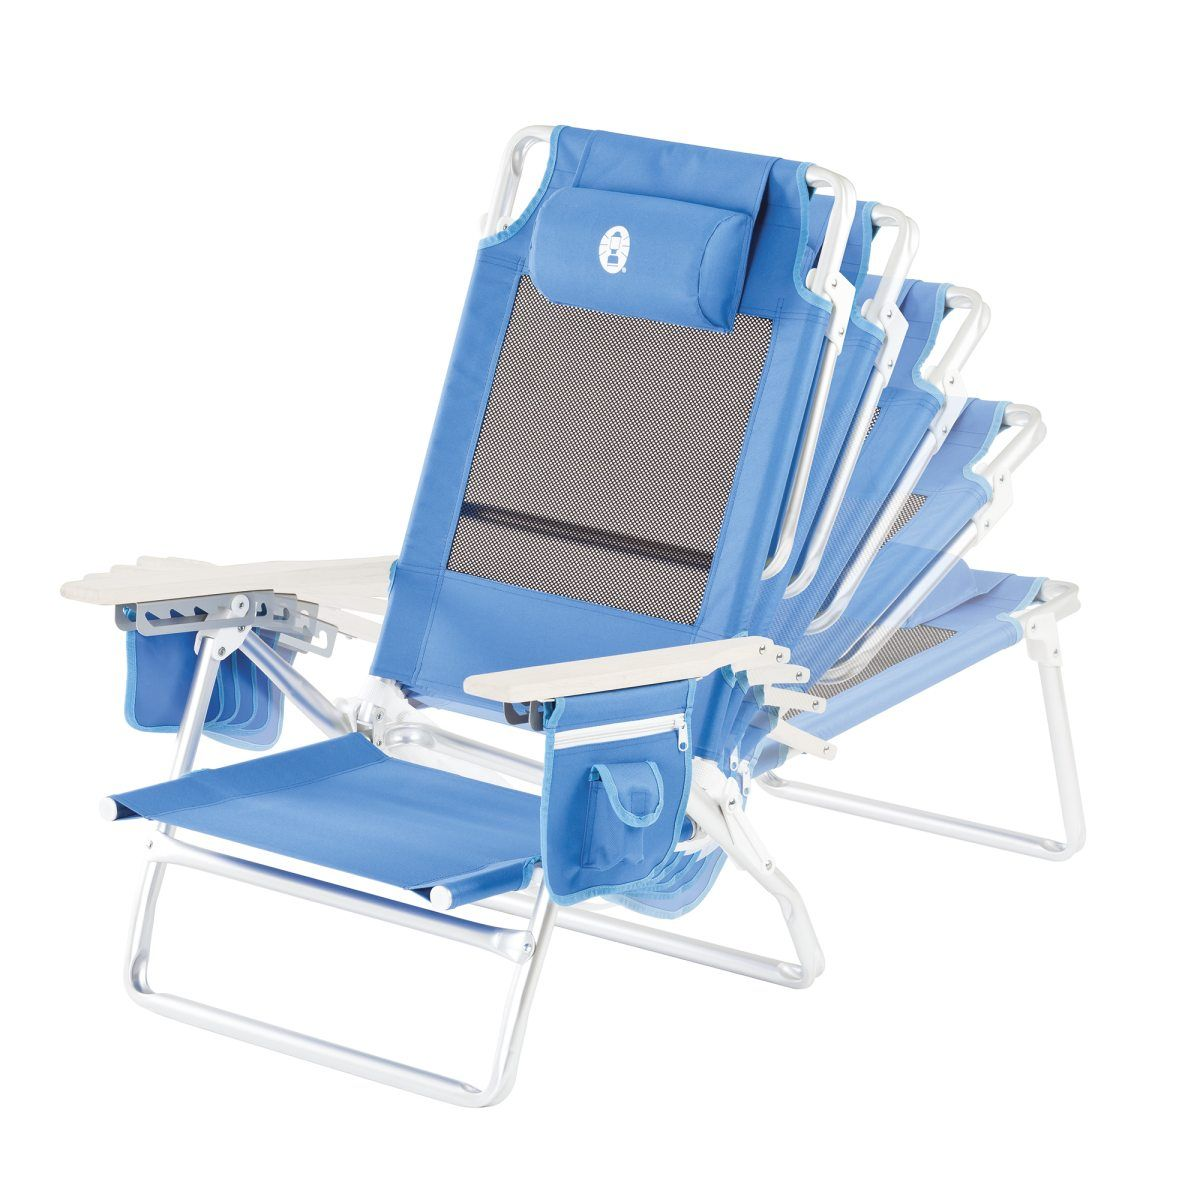 Coleman Low Recliner Chair Beach Solstol